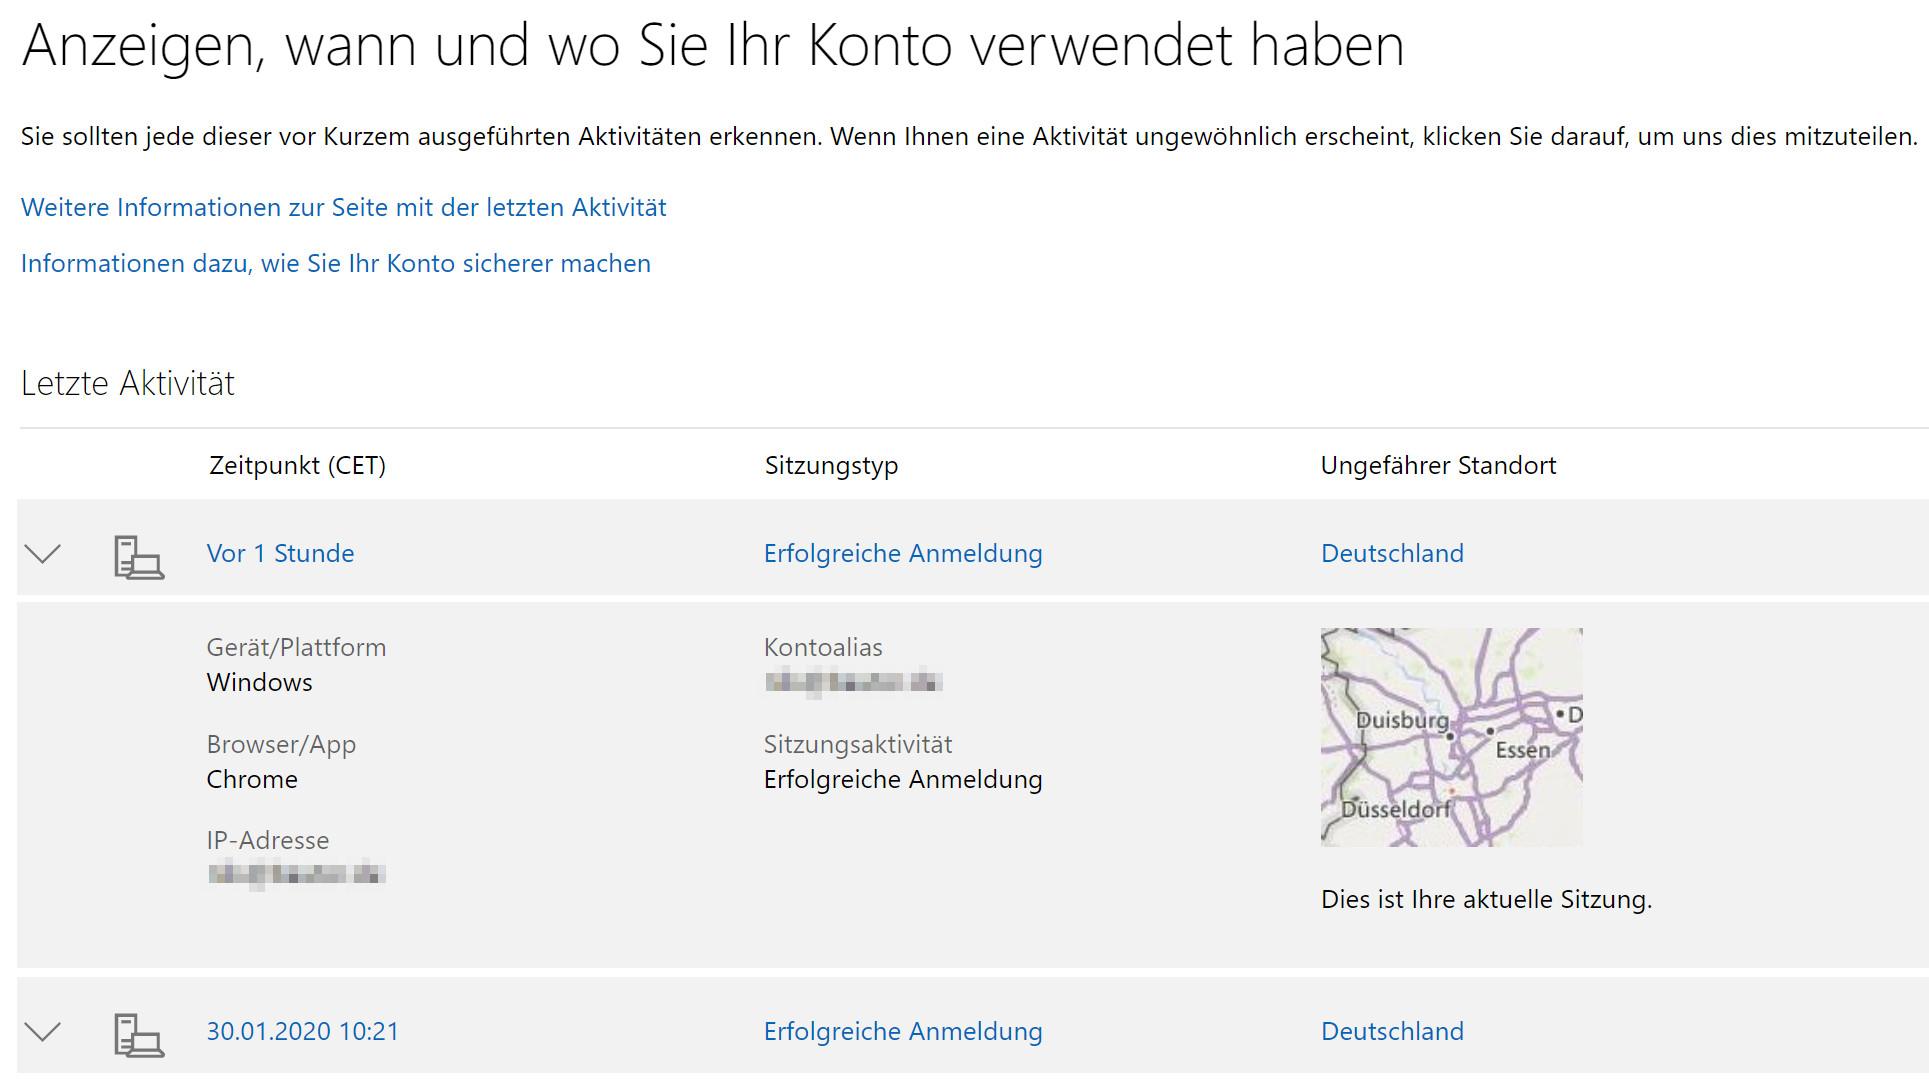 Microsoft-Konto: Ungefähre Standorte